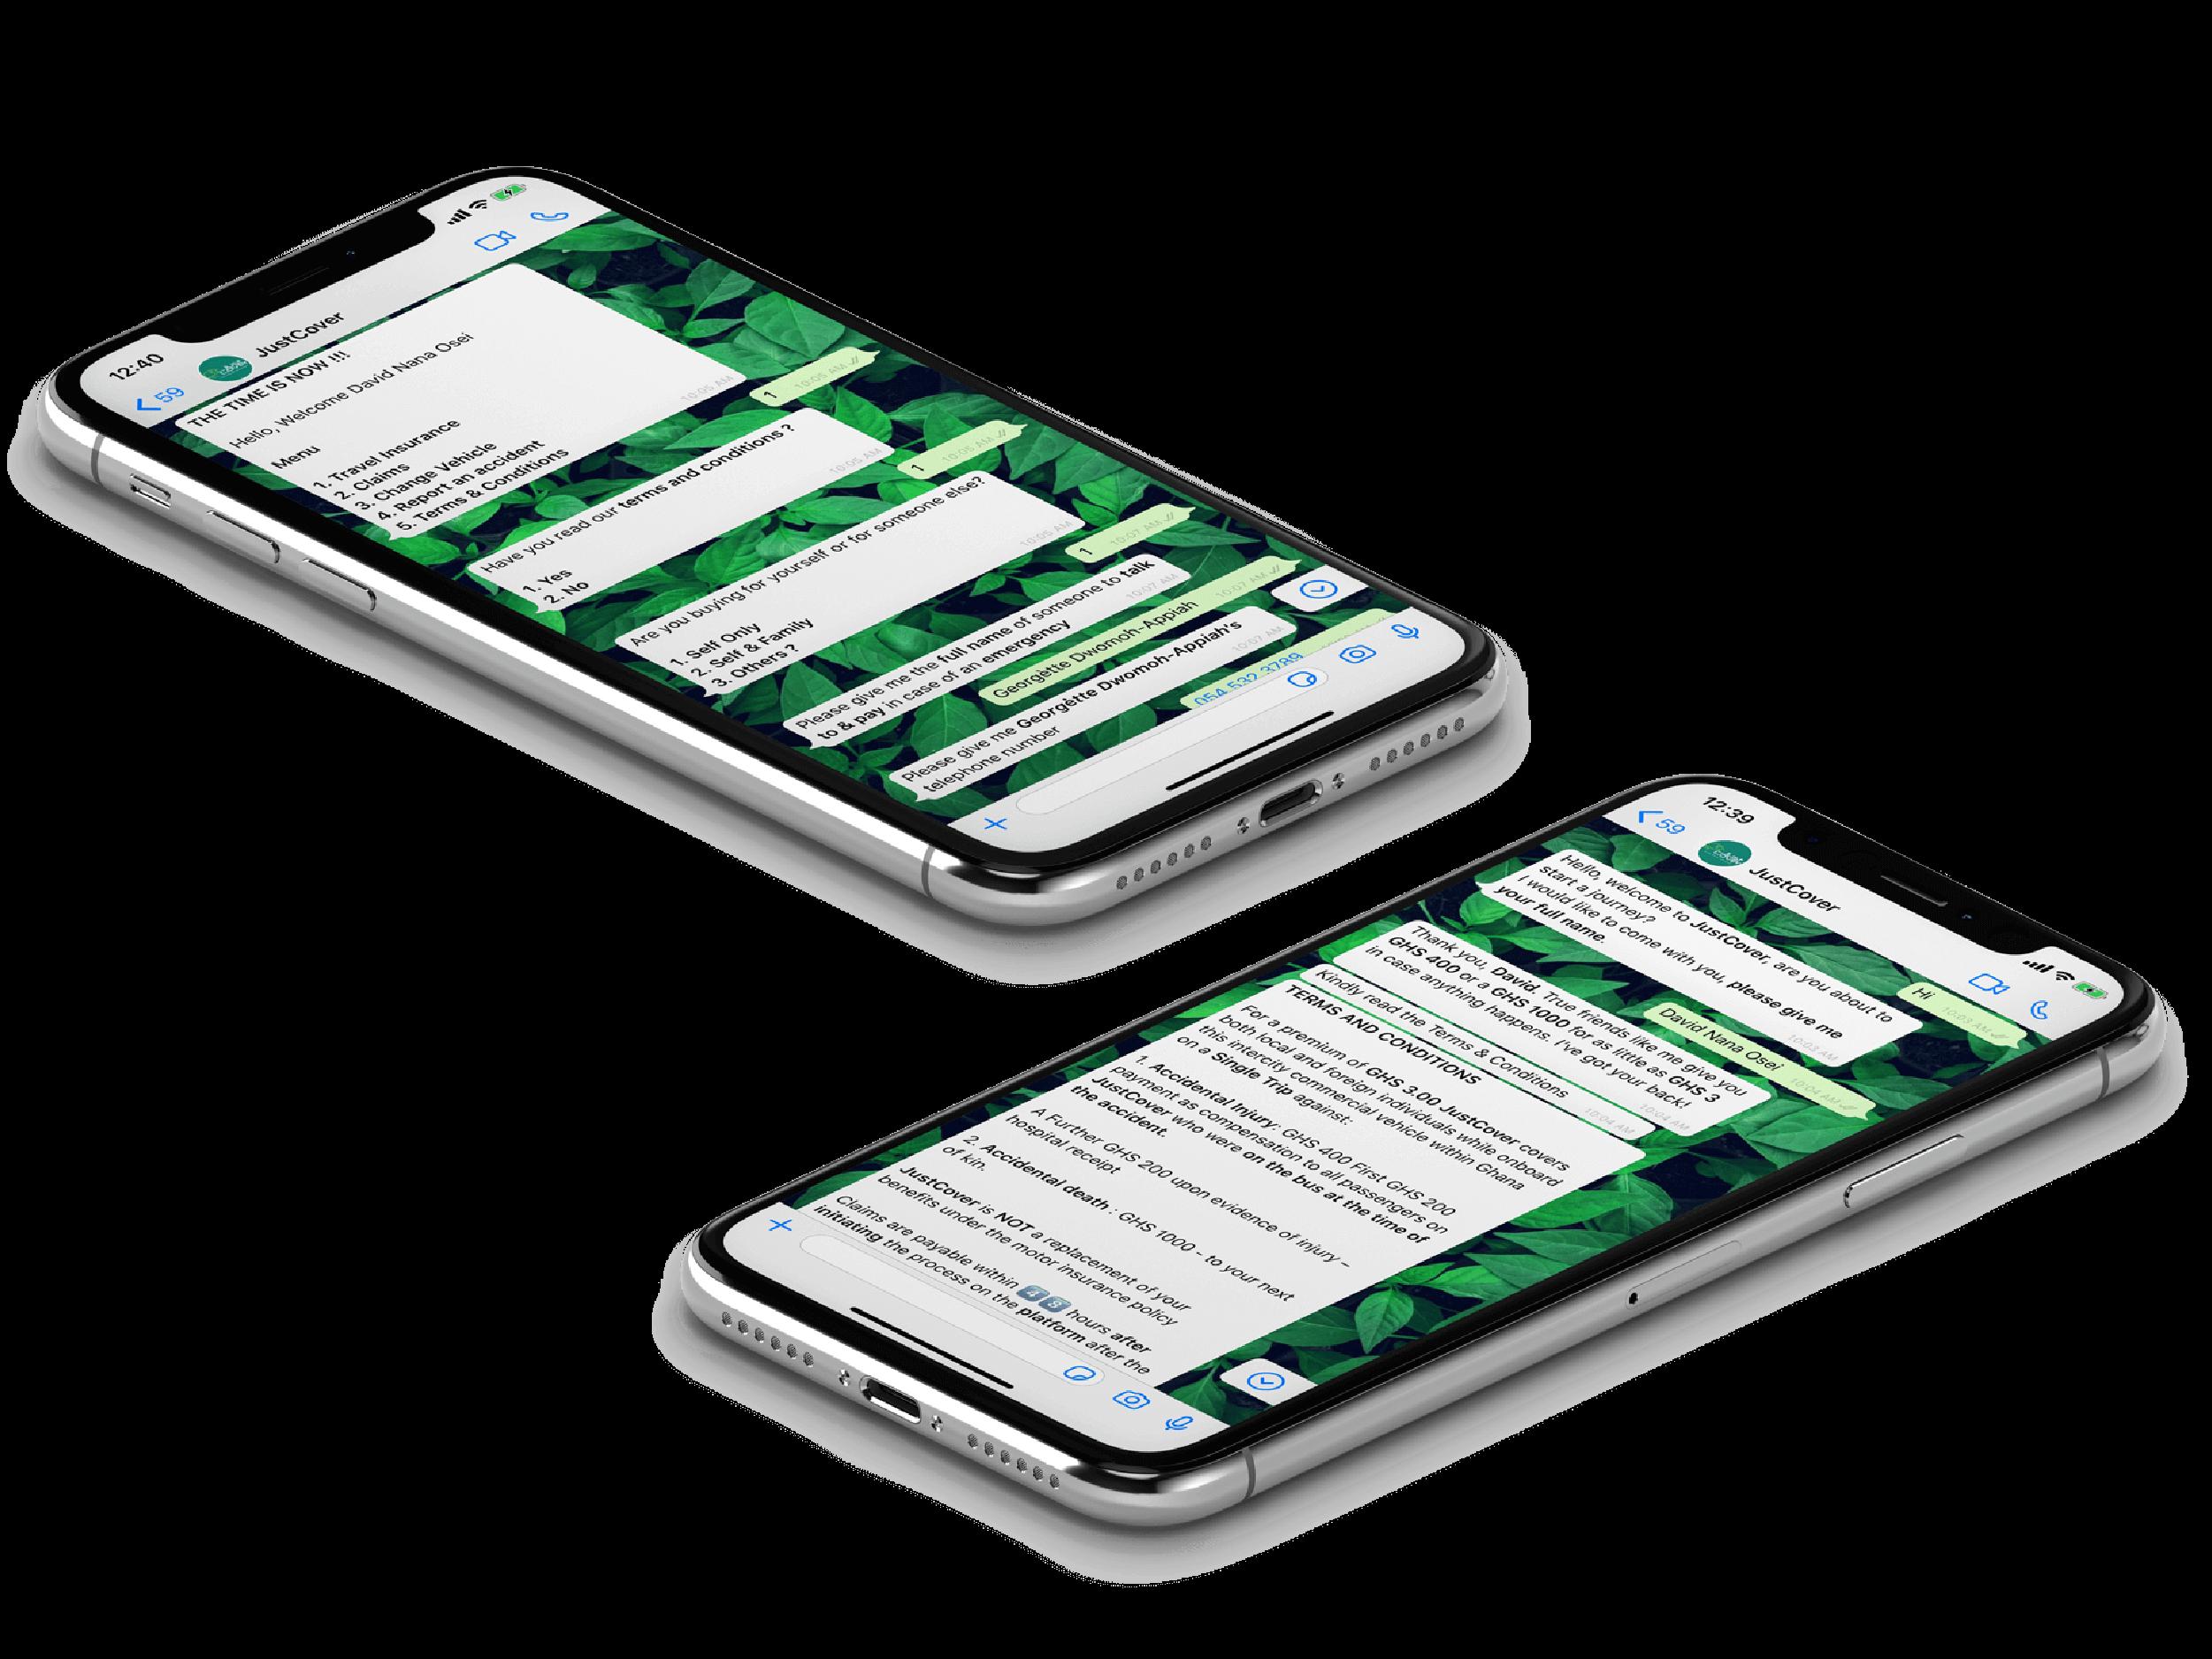 iPhone-X-Isometric-View-Mockup 2-19-19